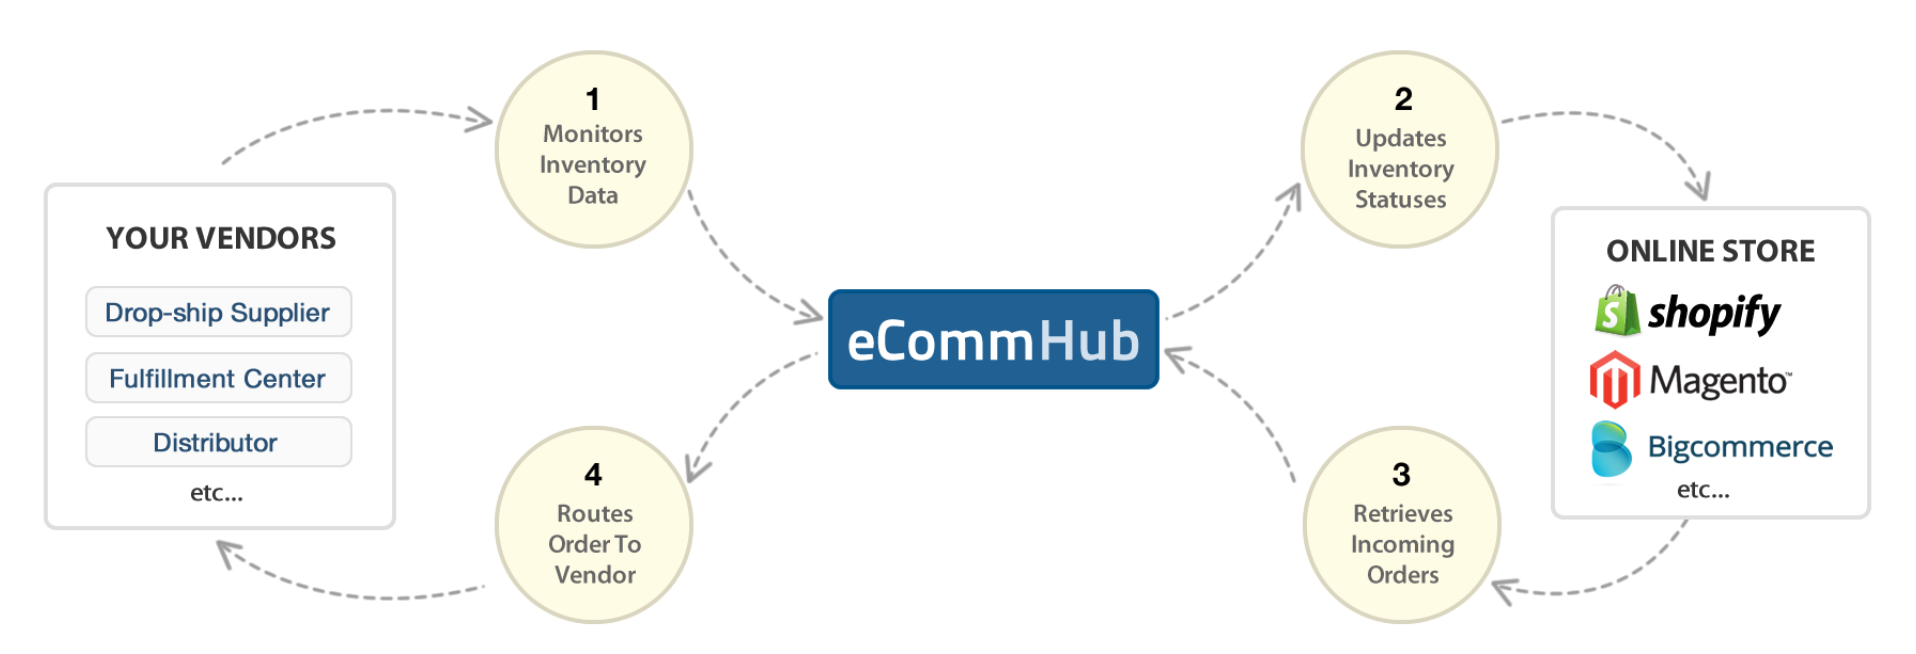 eCommHub